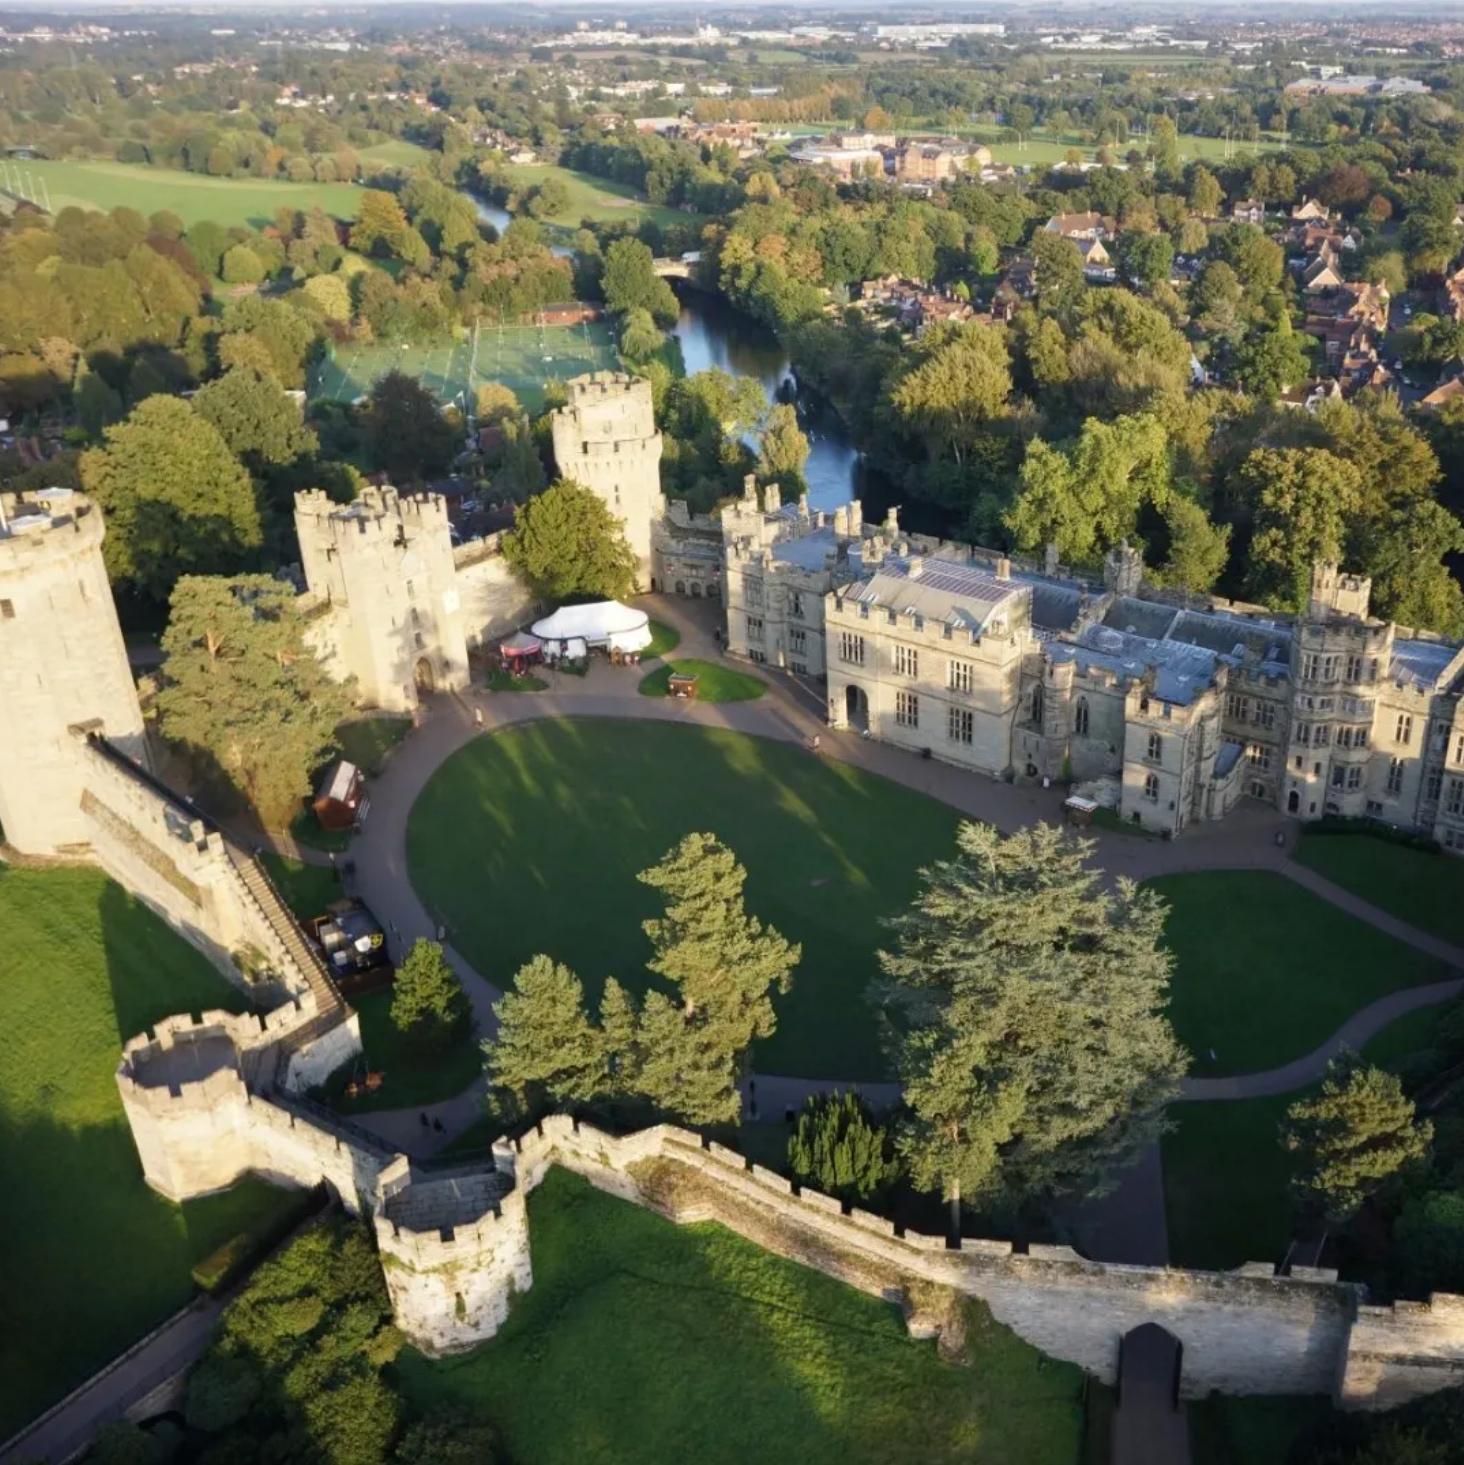 Aug to Dec Premier Inn Rooms £35 or less near attractions / theme parks - Warwick Castle / Alton Towers / Chessington + more @ Premier Inn